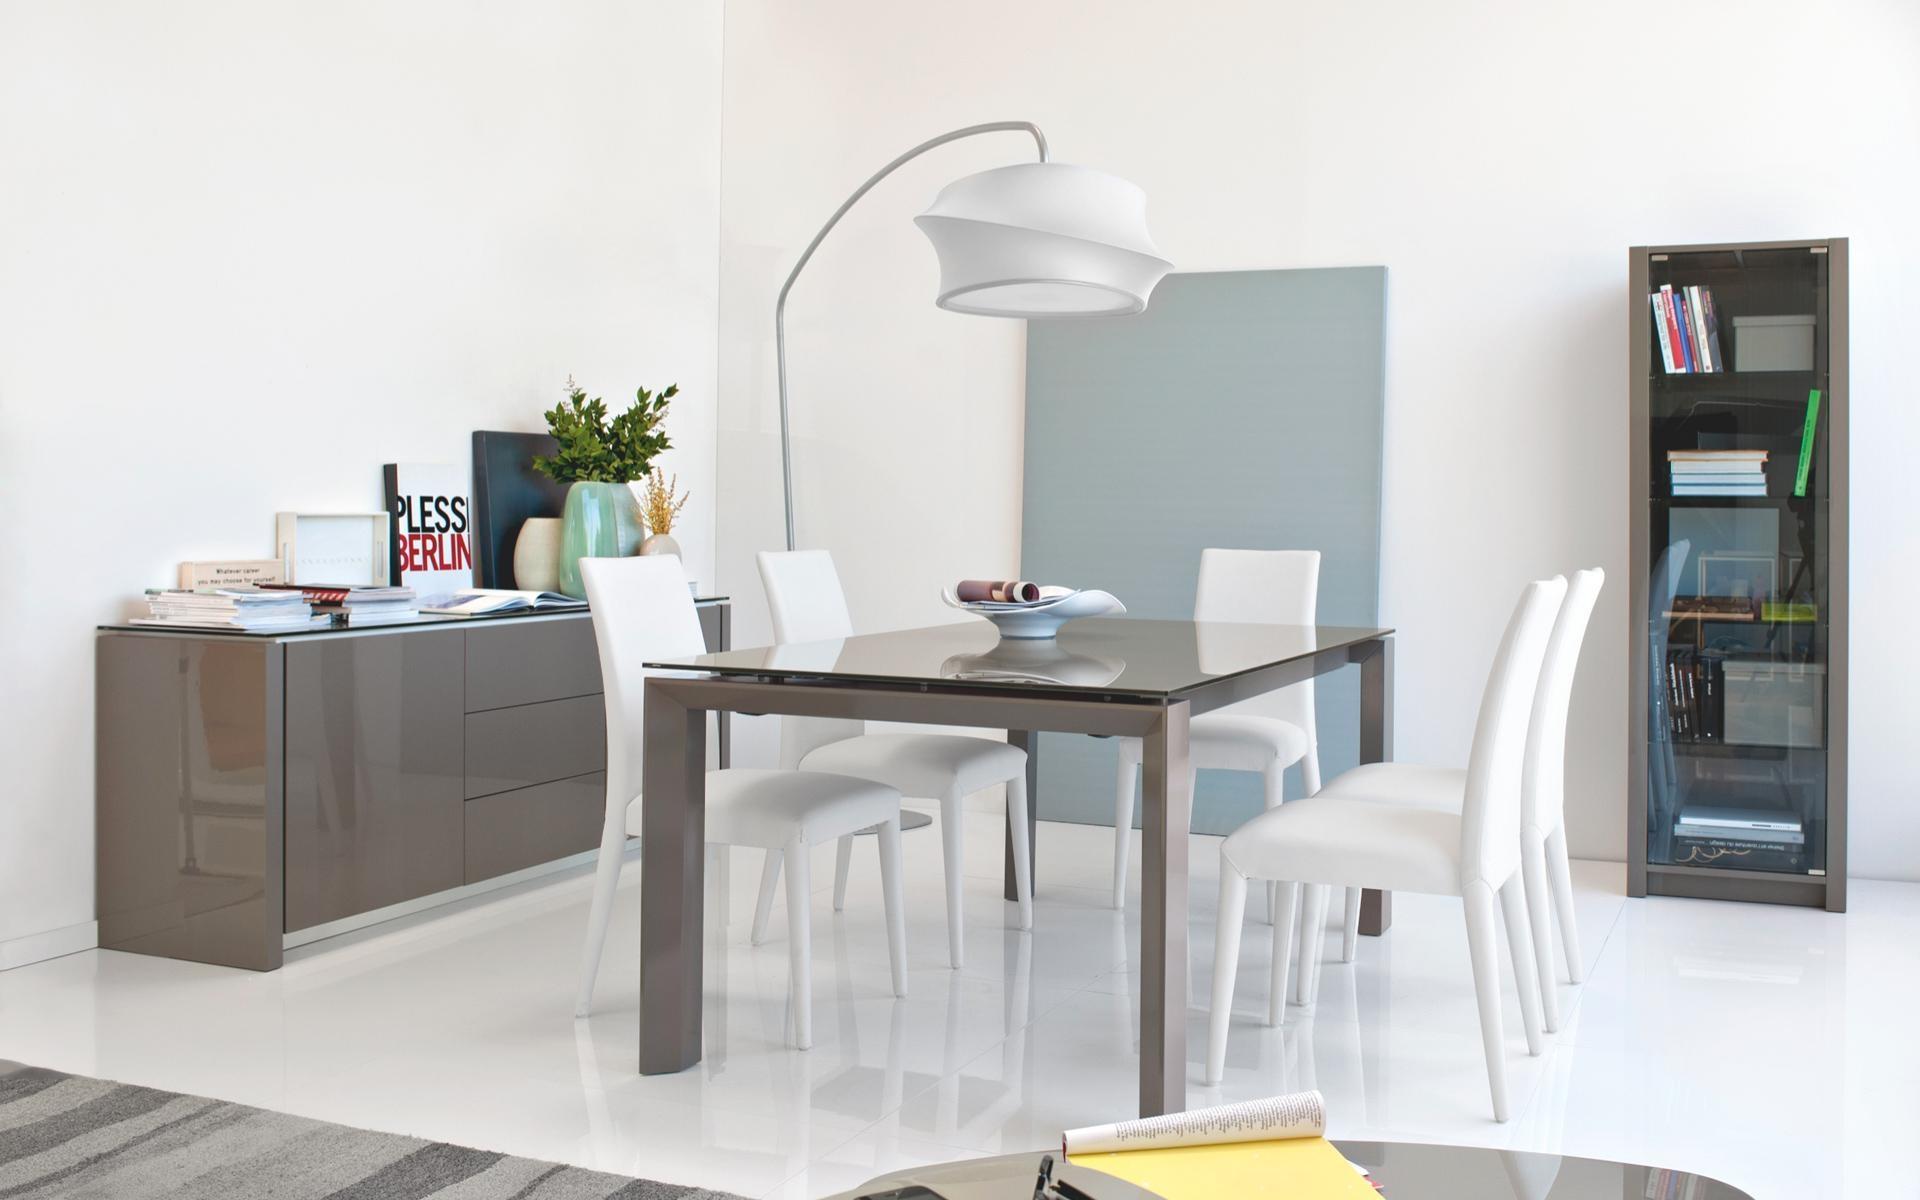 Tavolo omnia glass calligaris offerta tavoli a prezzi for Glass tavoli cristallo